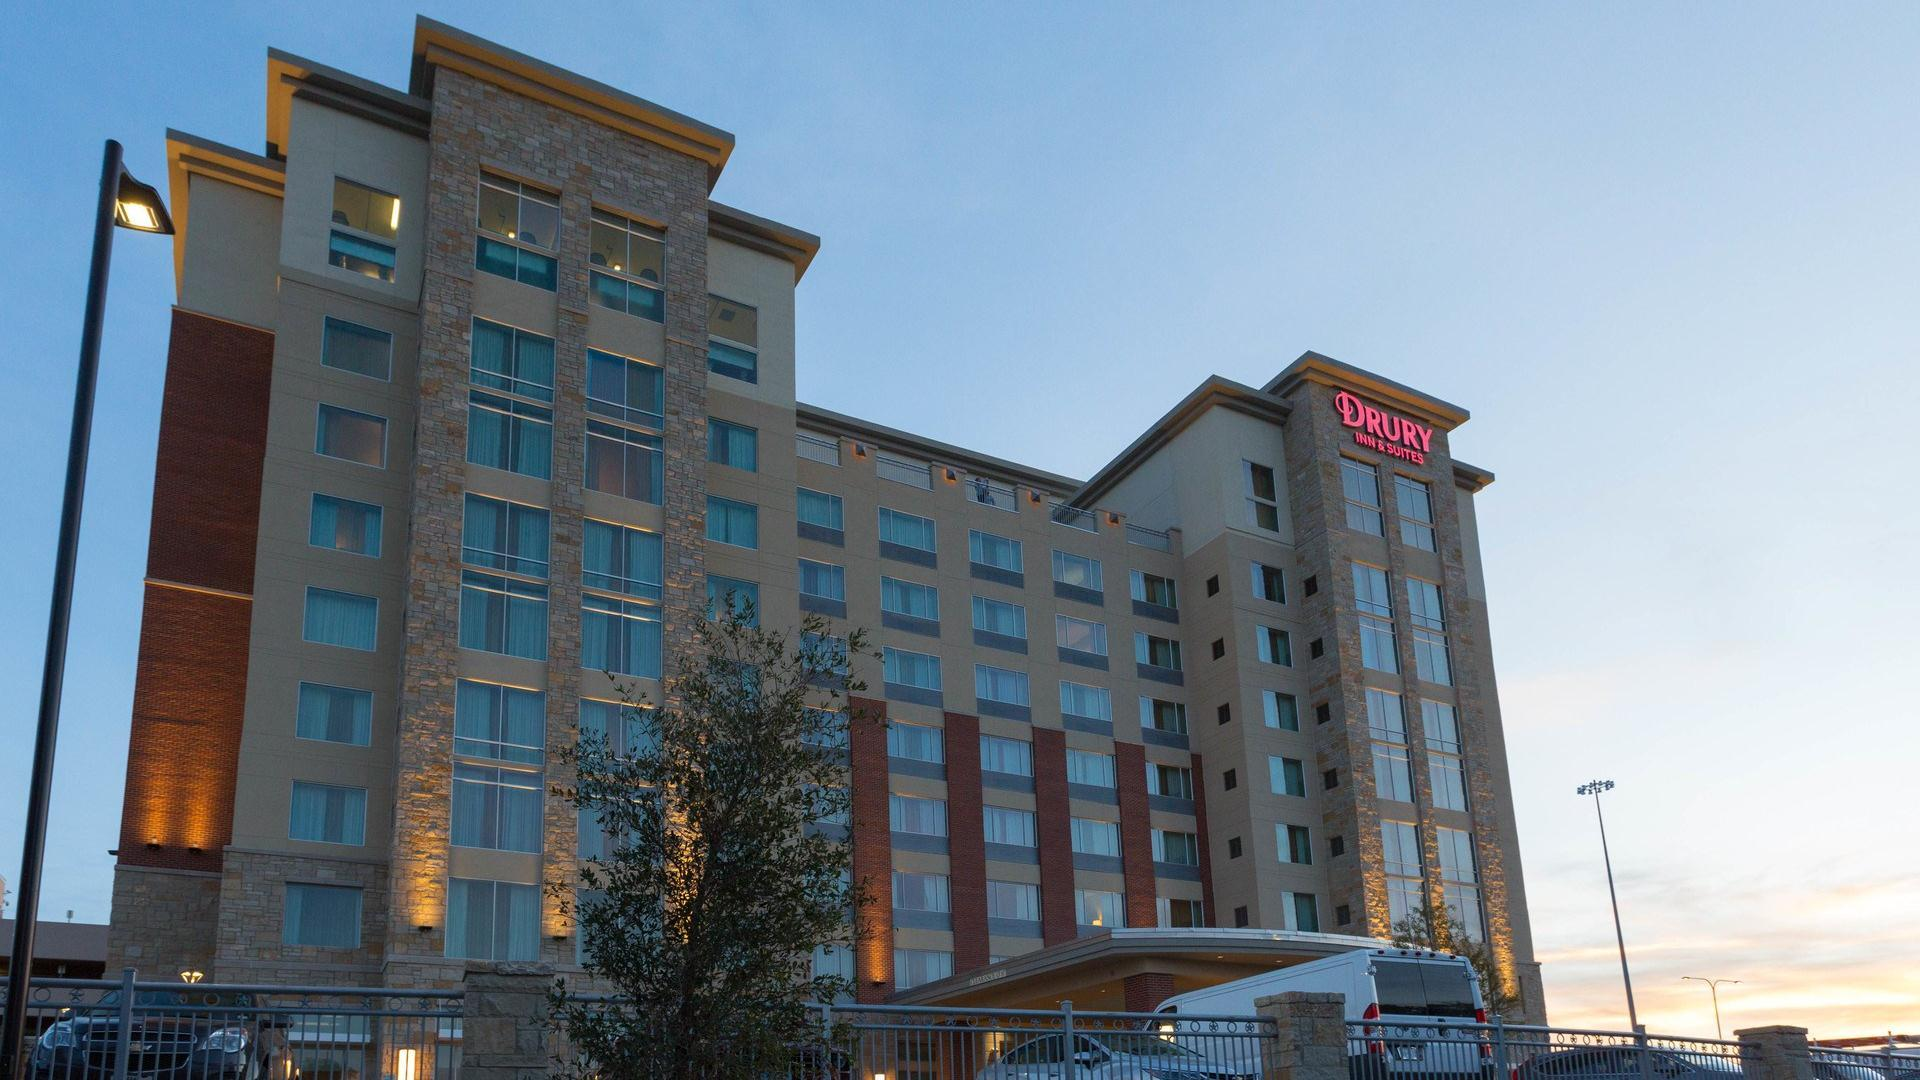 Meetings Events At Drury Inn Suites Dallas Frisco Frisco TX US - Drury inn us map